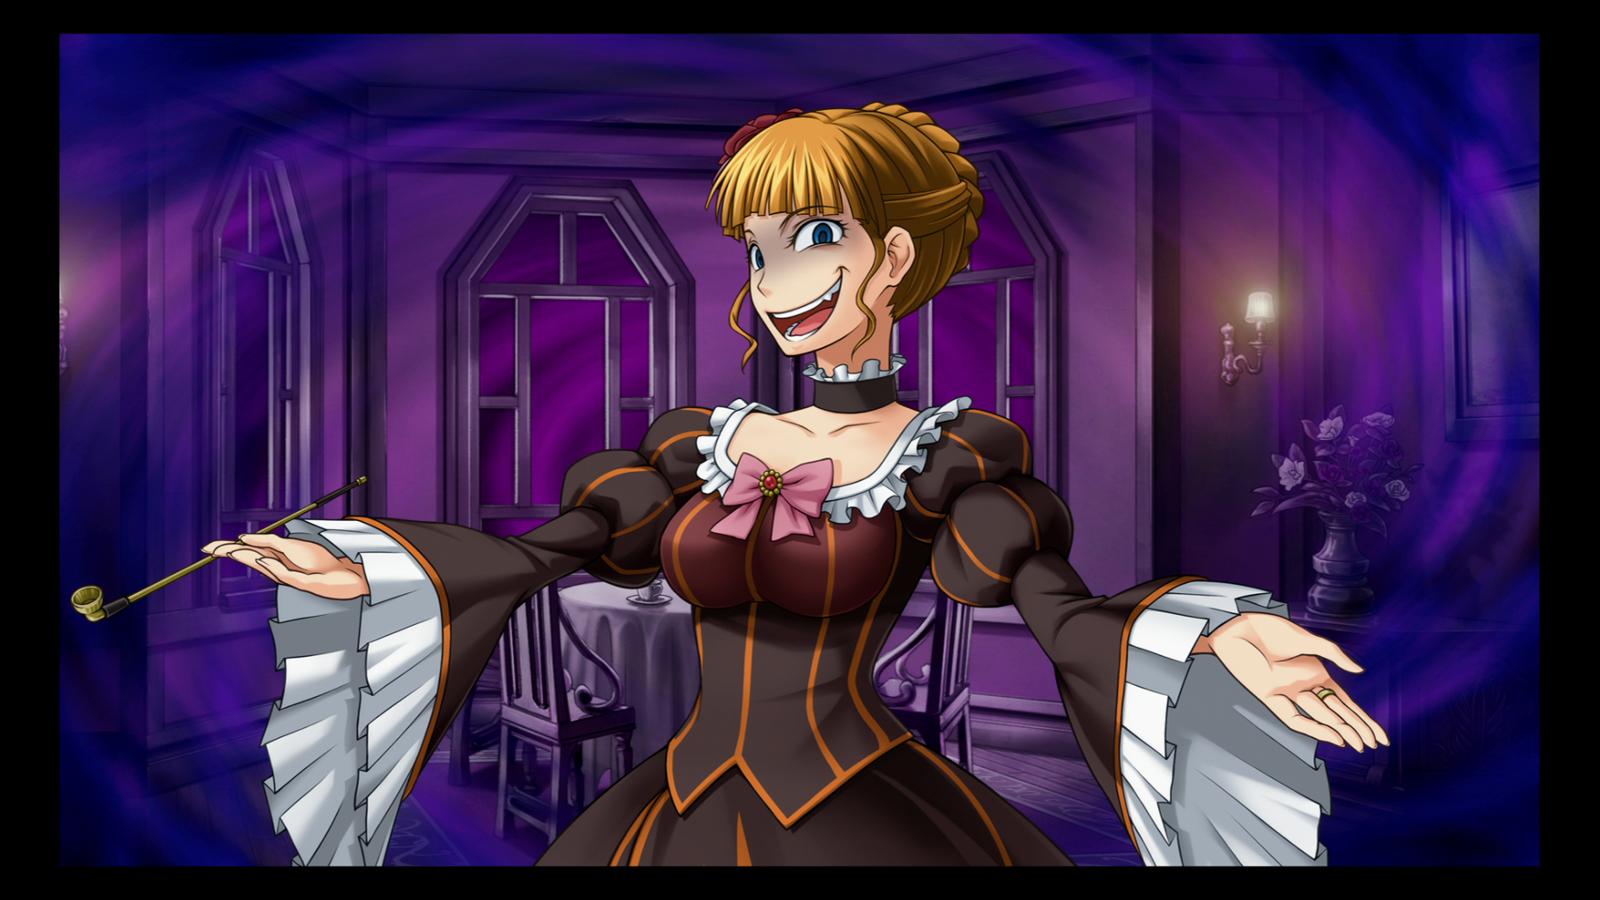 Beatrice/#429446 - Zerochan